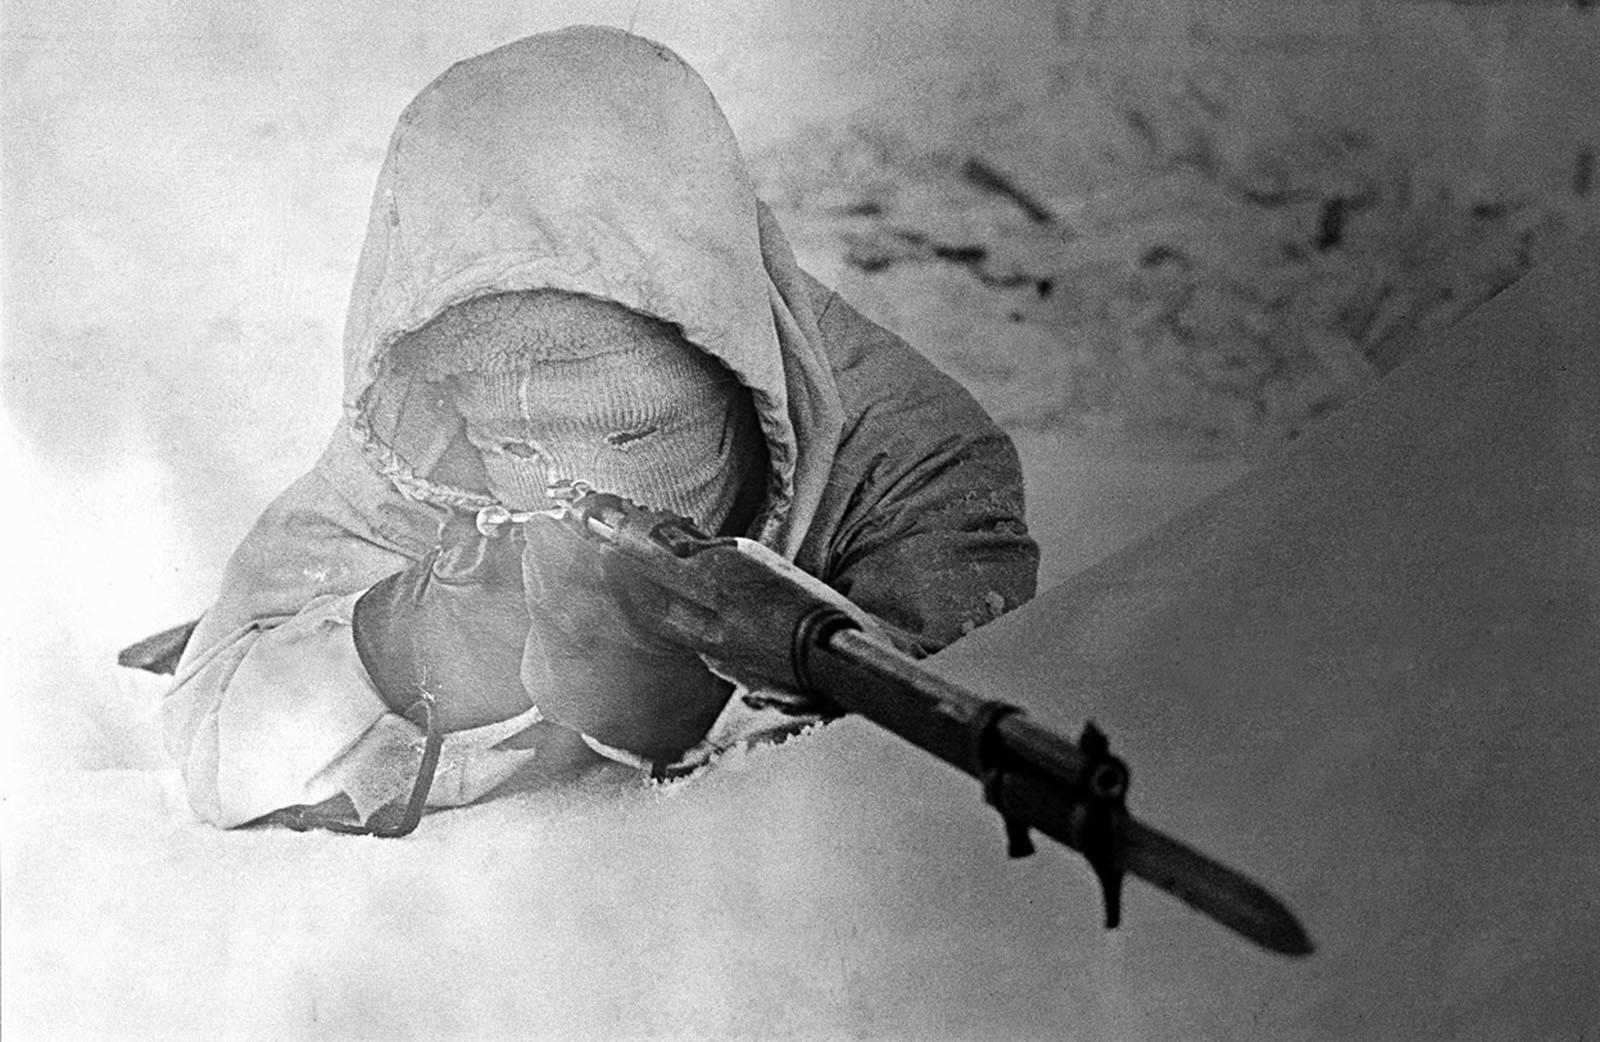 Simo Hayha, La Mort Blanche, dans l'hiver de camouflage, 1940